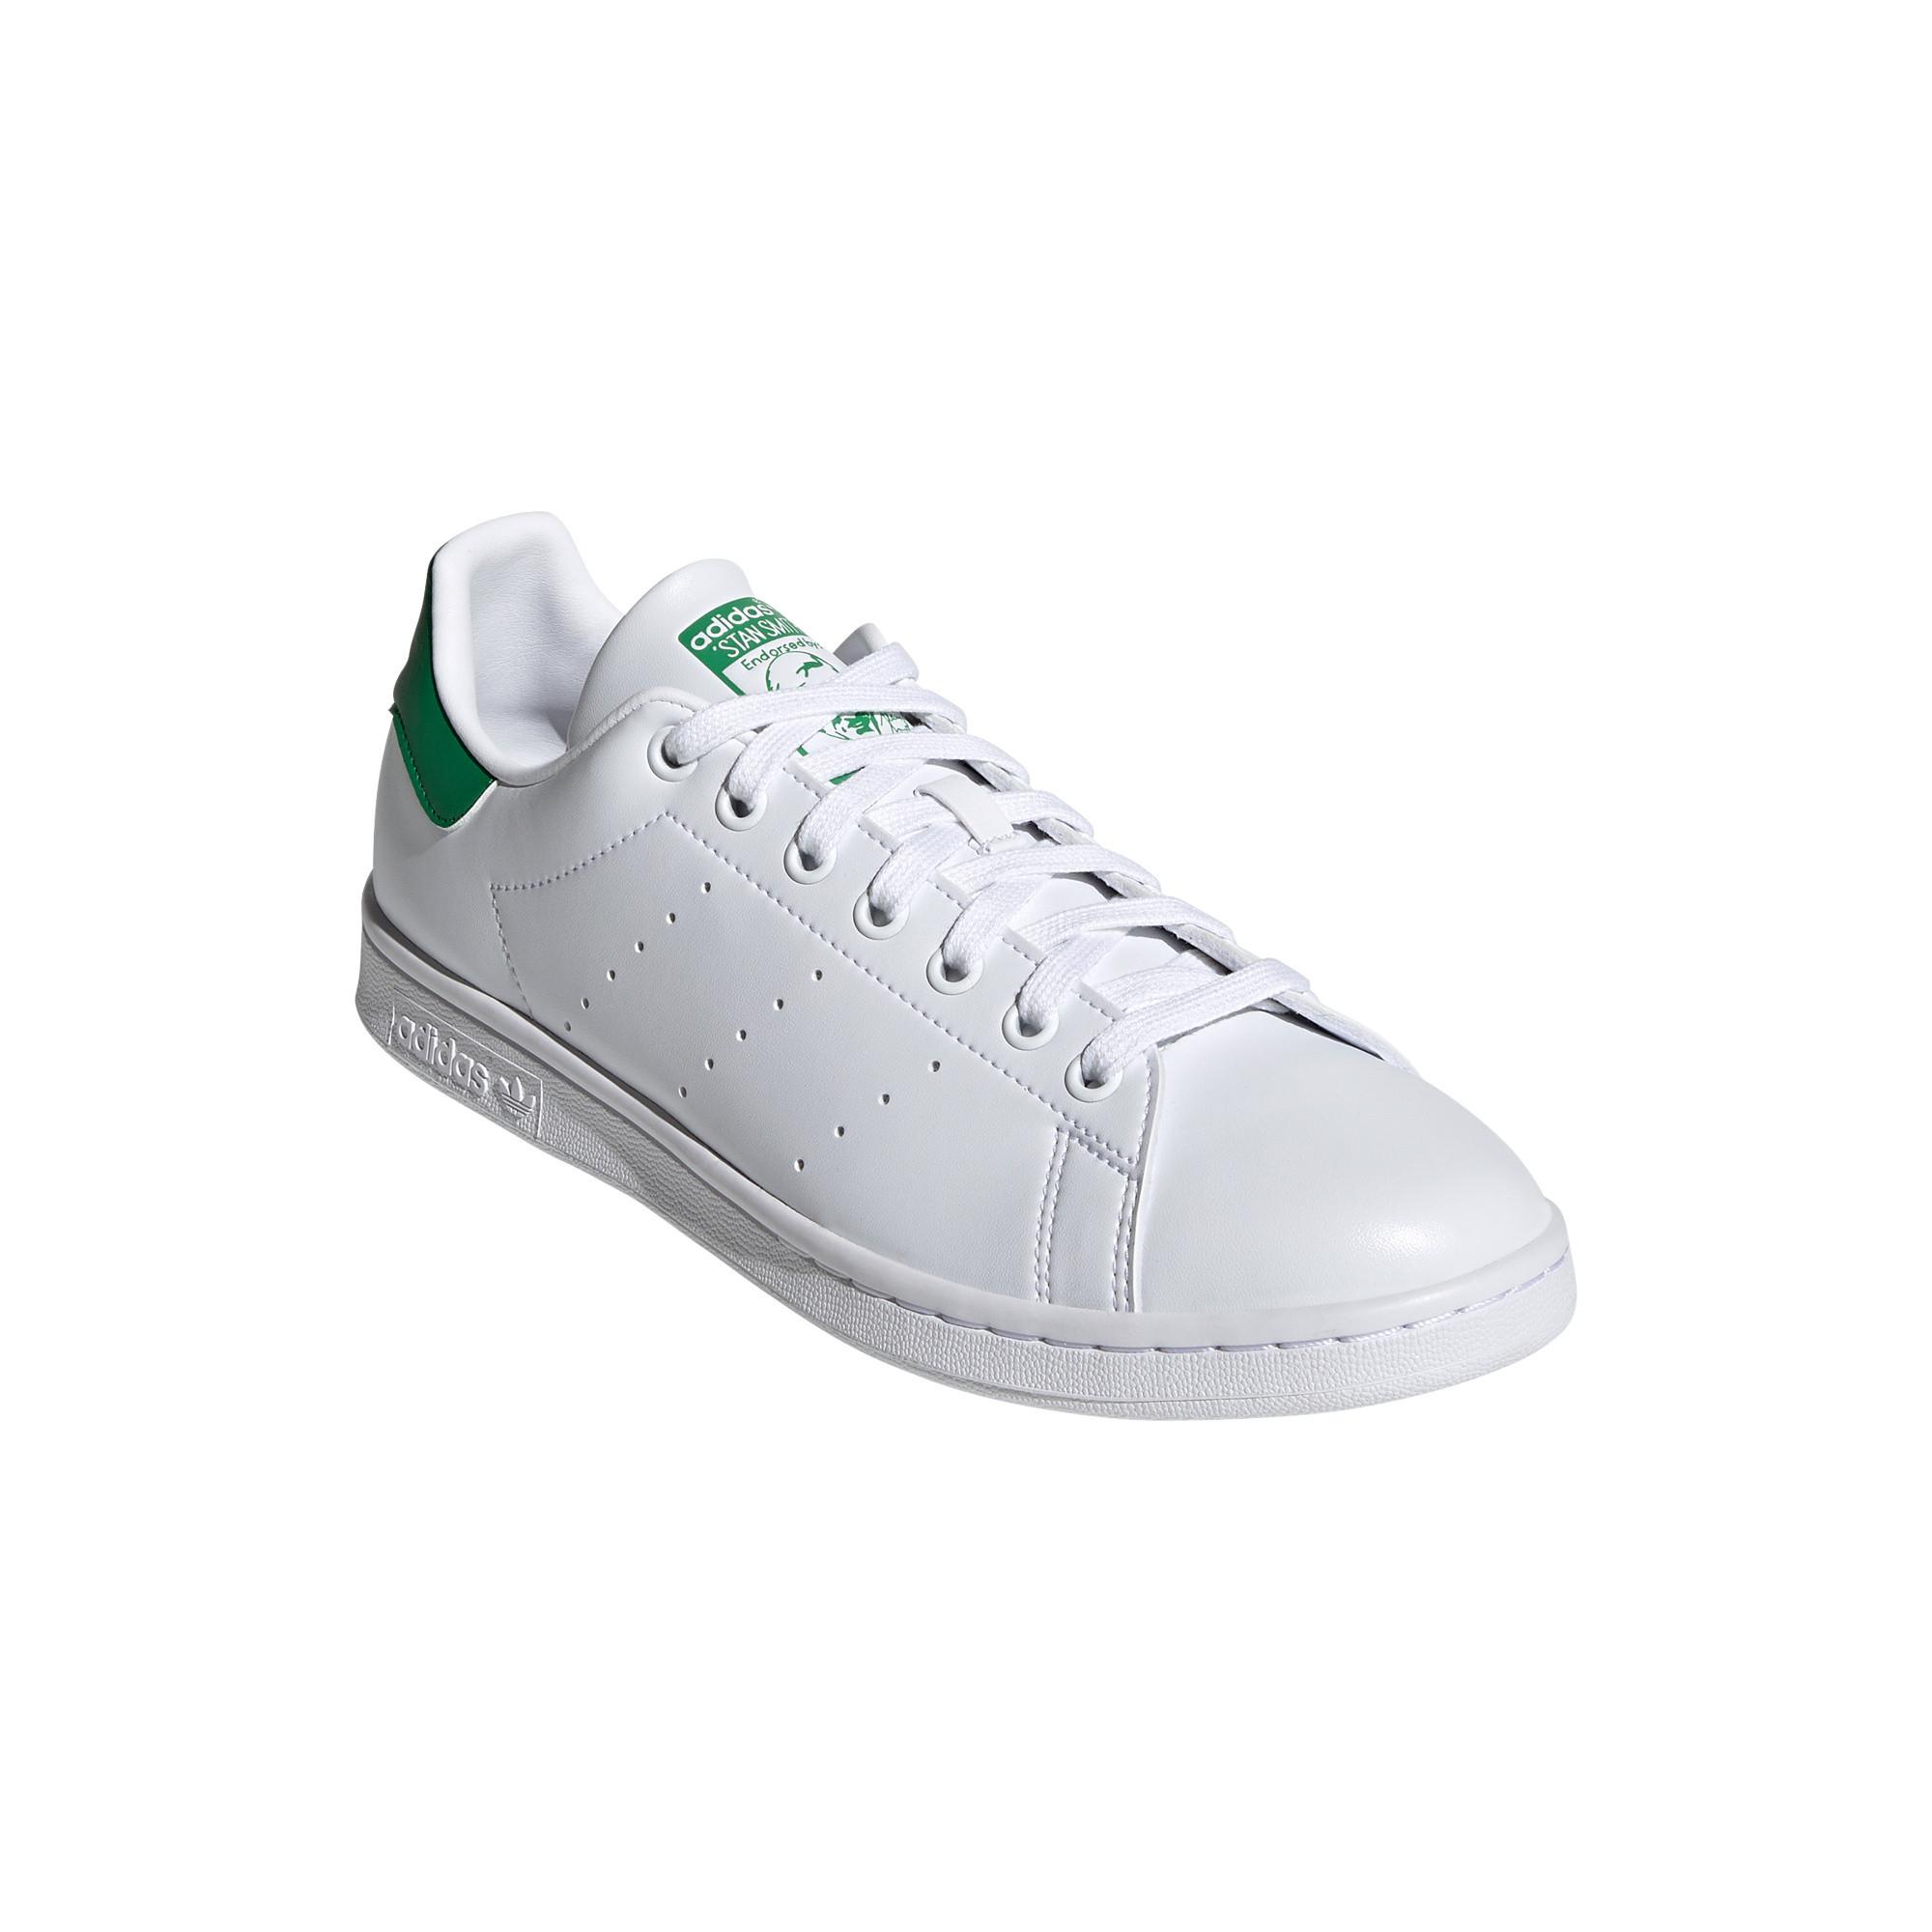 Stan Smith uomo, Bianco/Verde, large image number 0